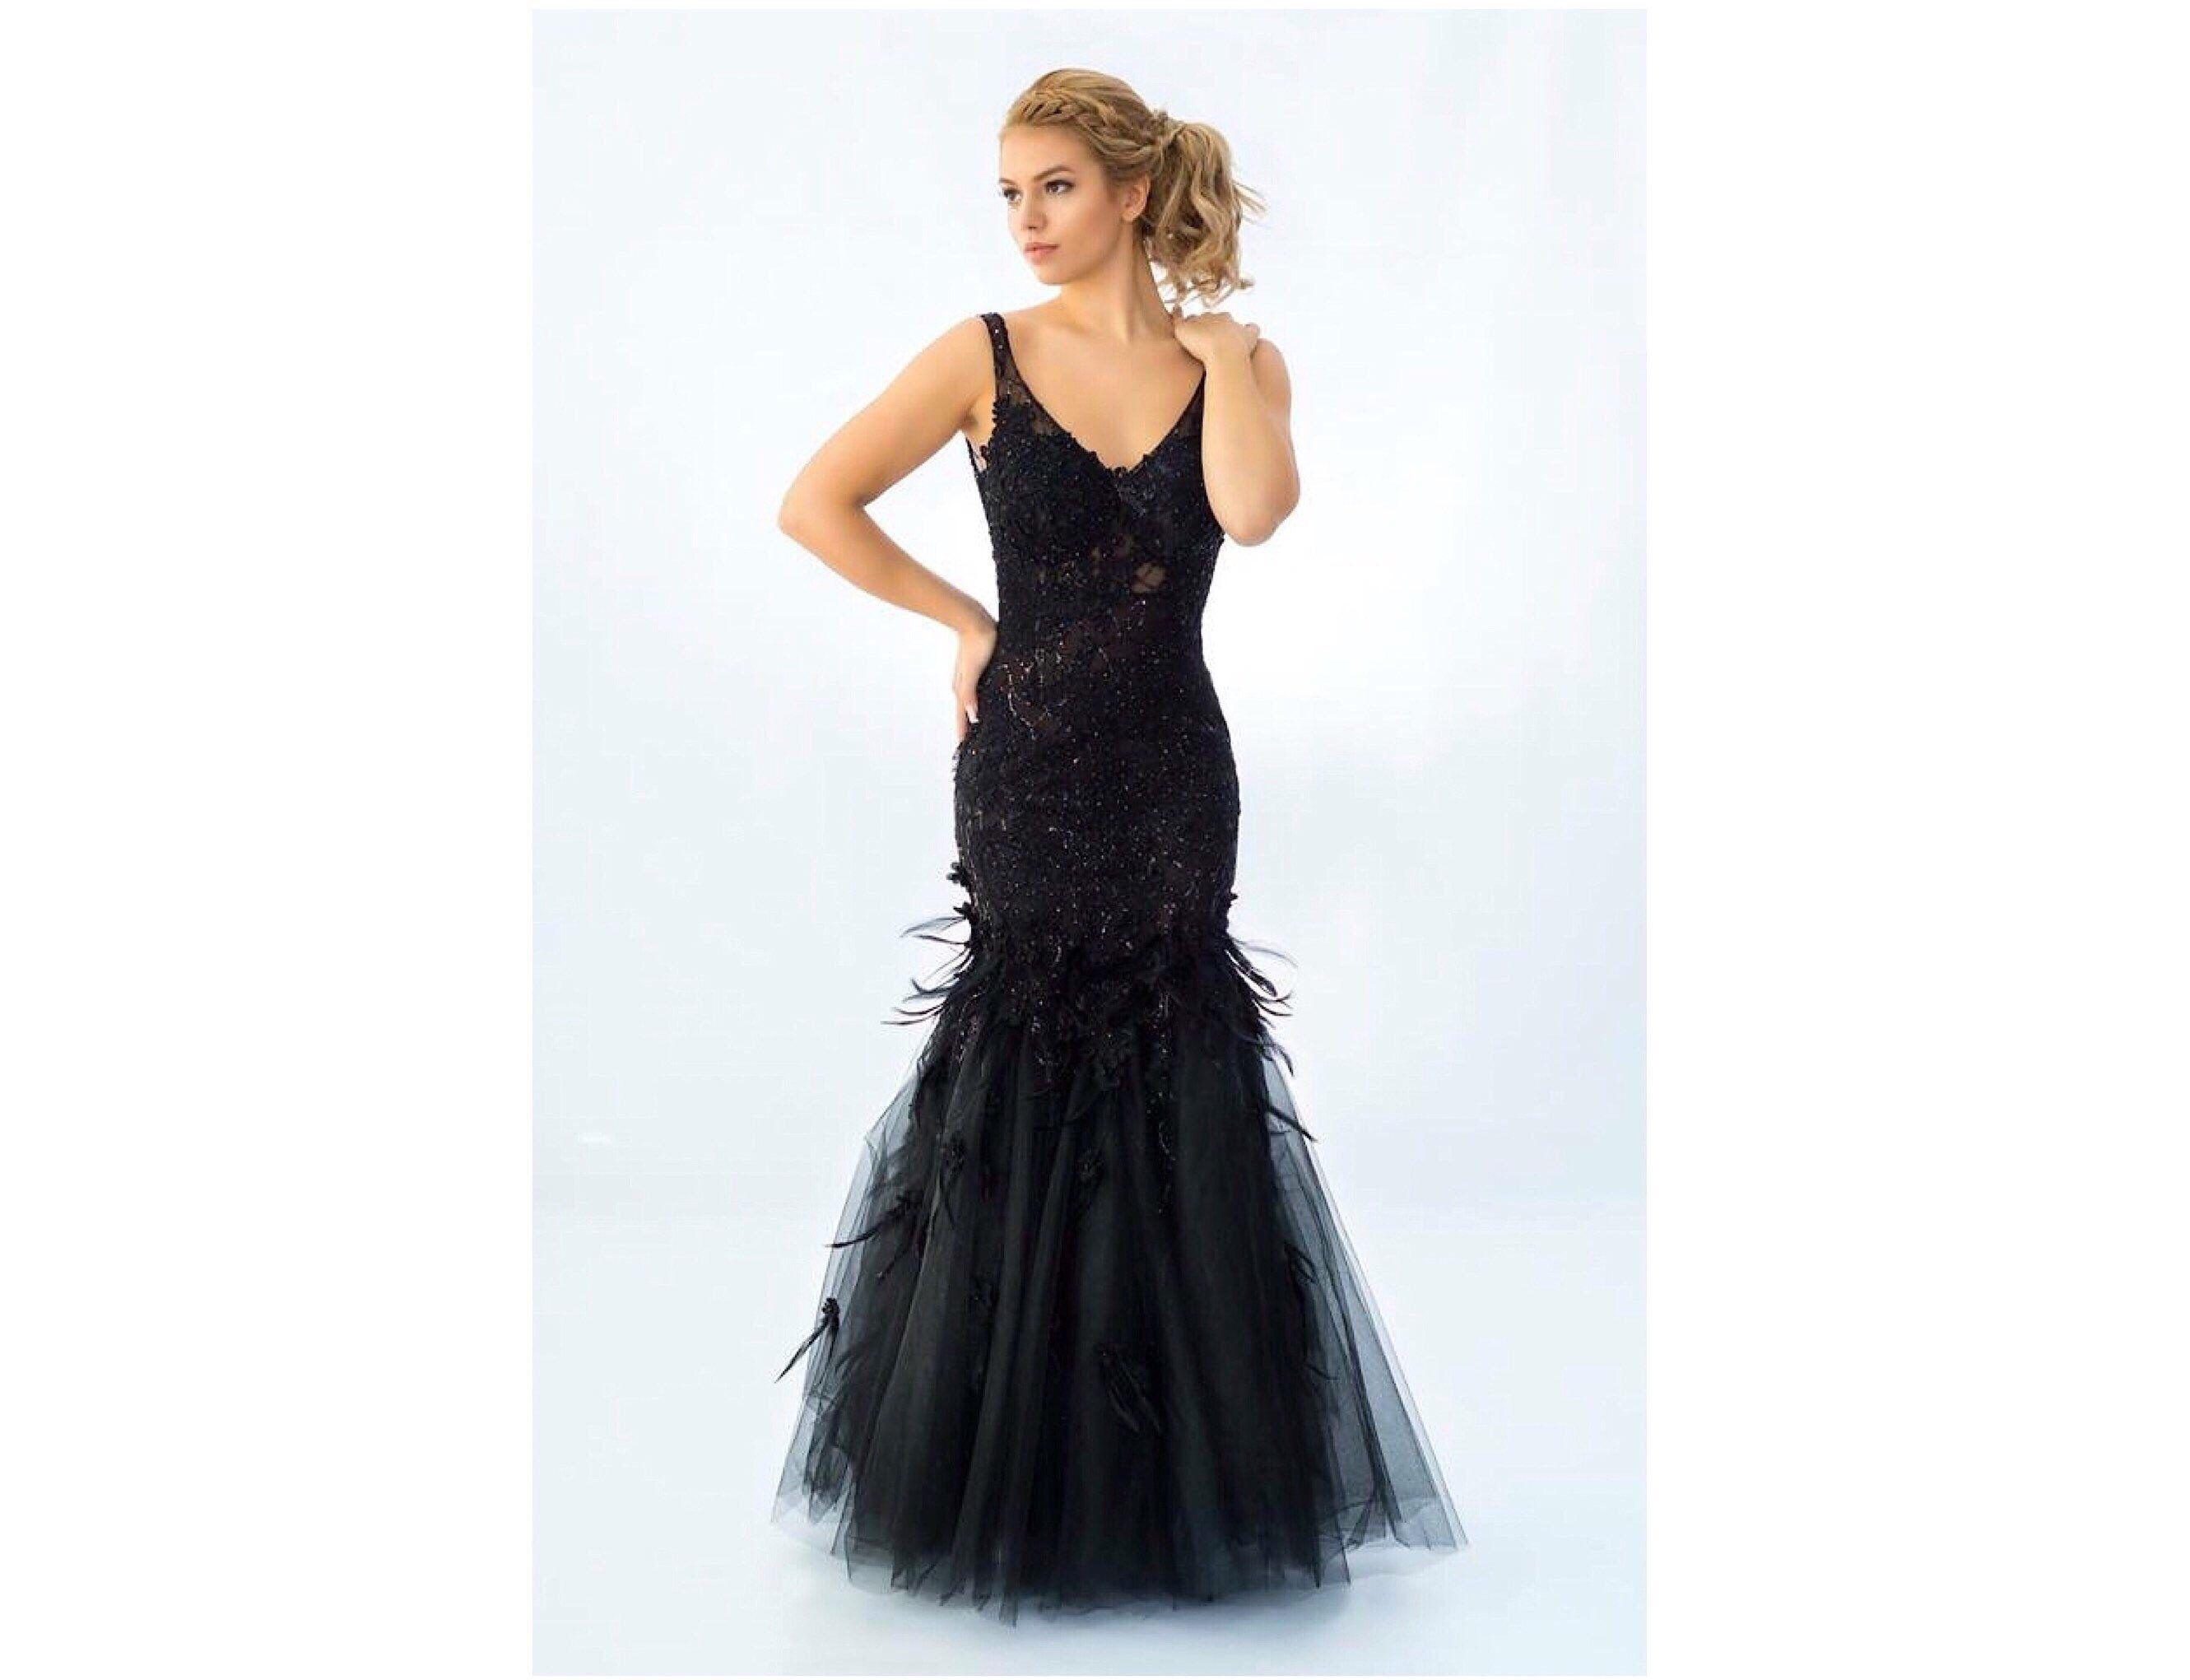 Black Gown Prom Dress Black Dress With Beaded Lace And Etsy Black Prom Dresses Dresses Black Gown [ 2041 x 2661 Pixel ]